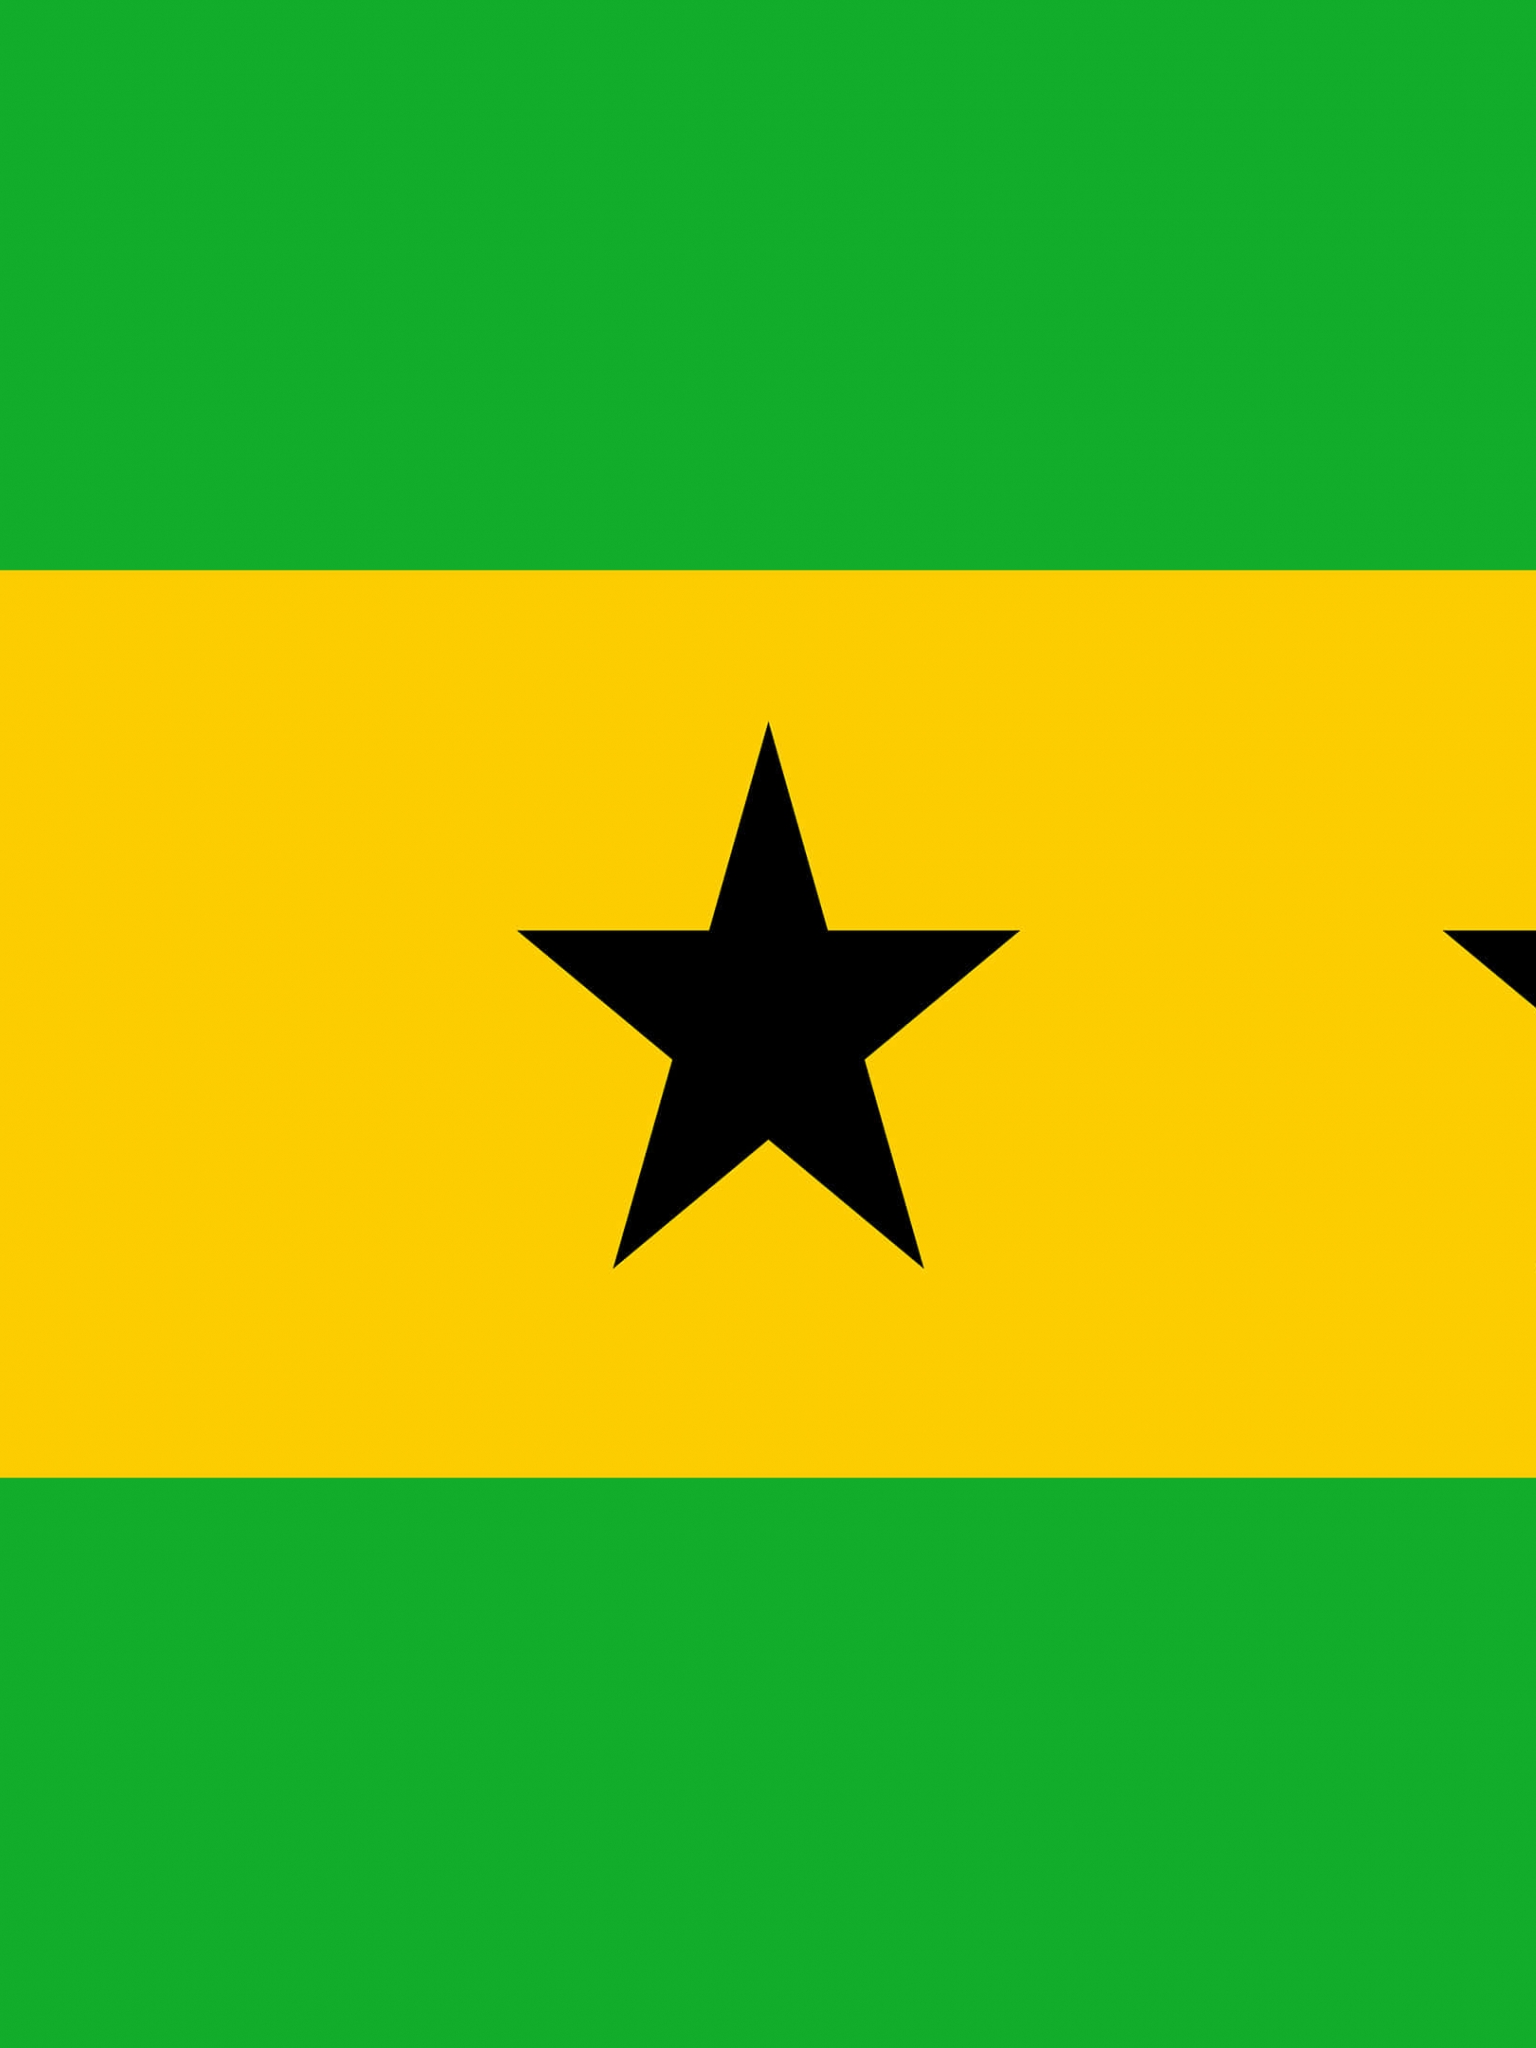 download Sao Tome And Principe Flag UHD 4K Wallpaper Pixelz 1536x2048